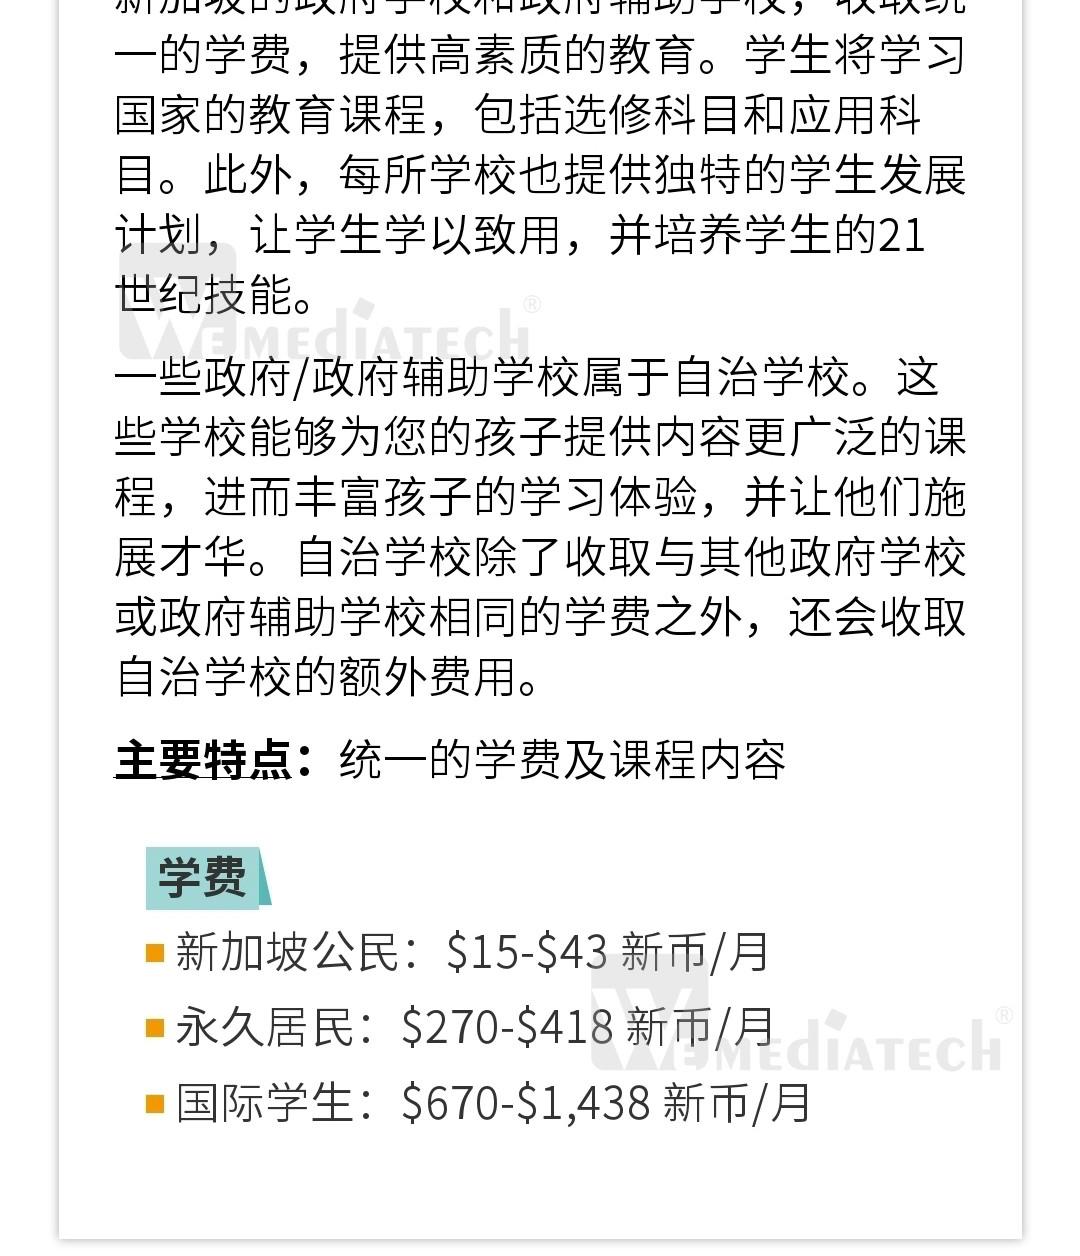 zhongxue-2_qietu_5.jpg